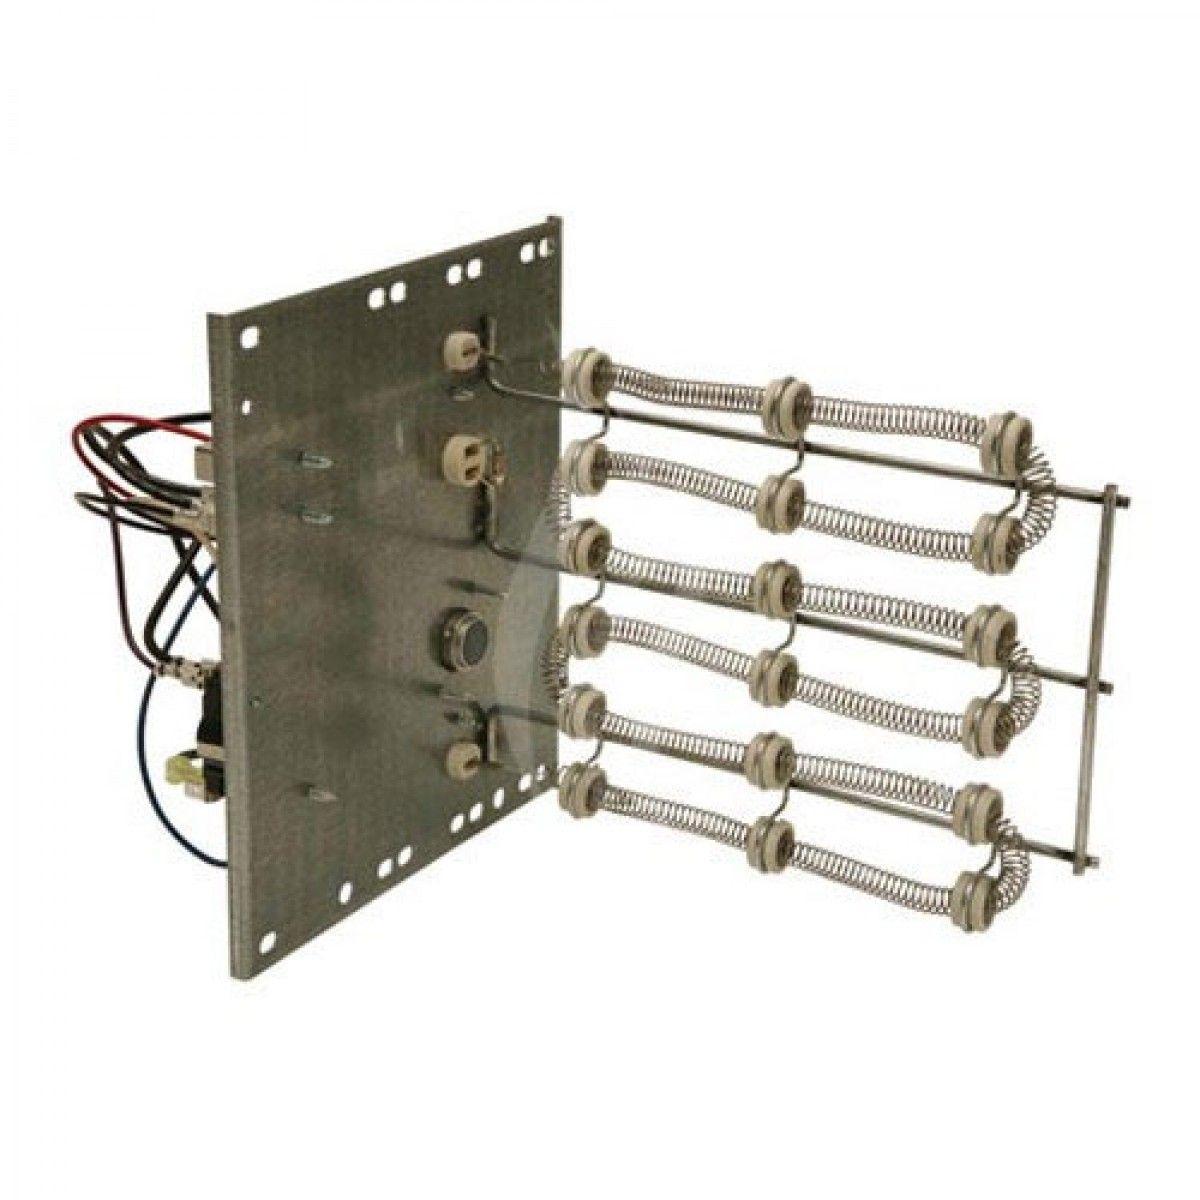 15 Kw Rheem Rxbh Electric Strip Heater With Circuit